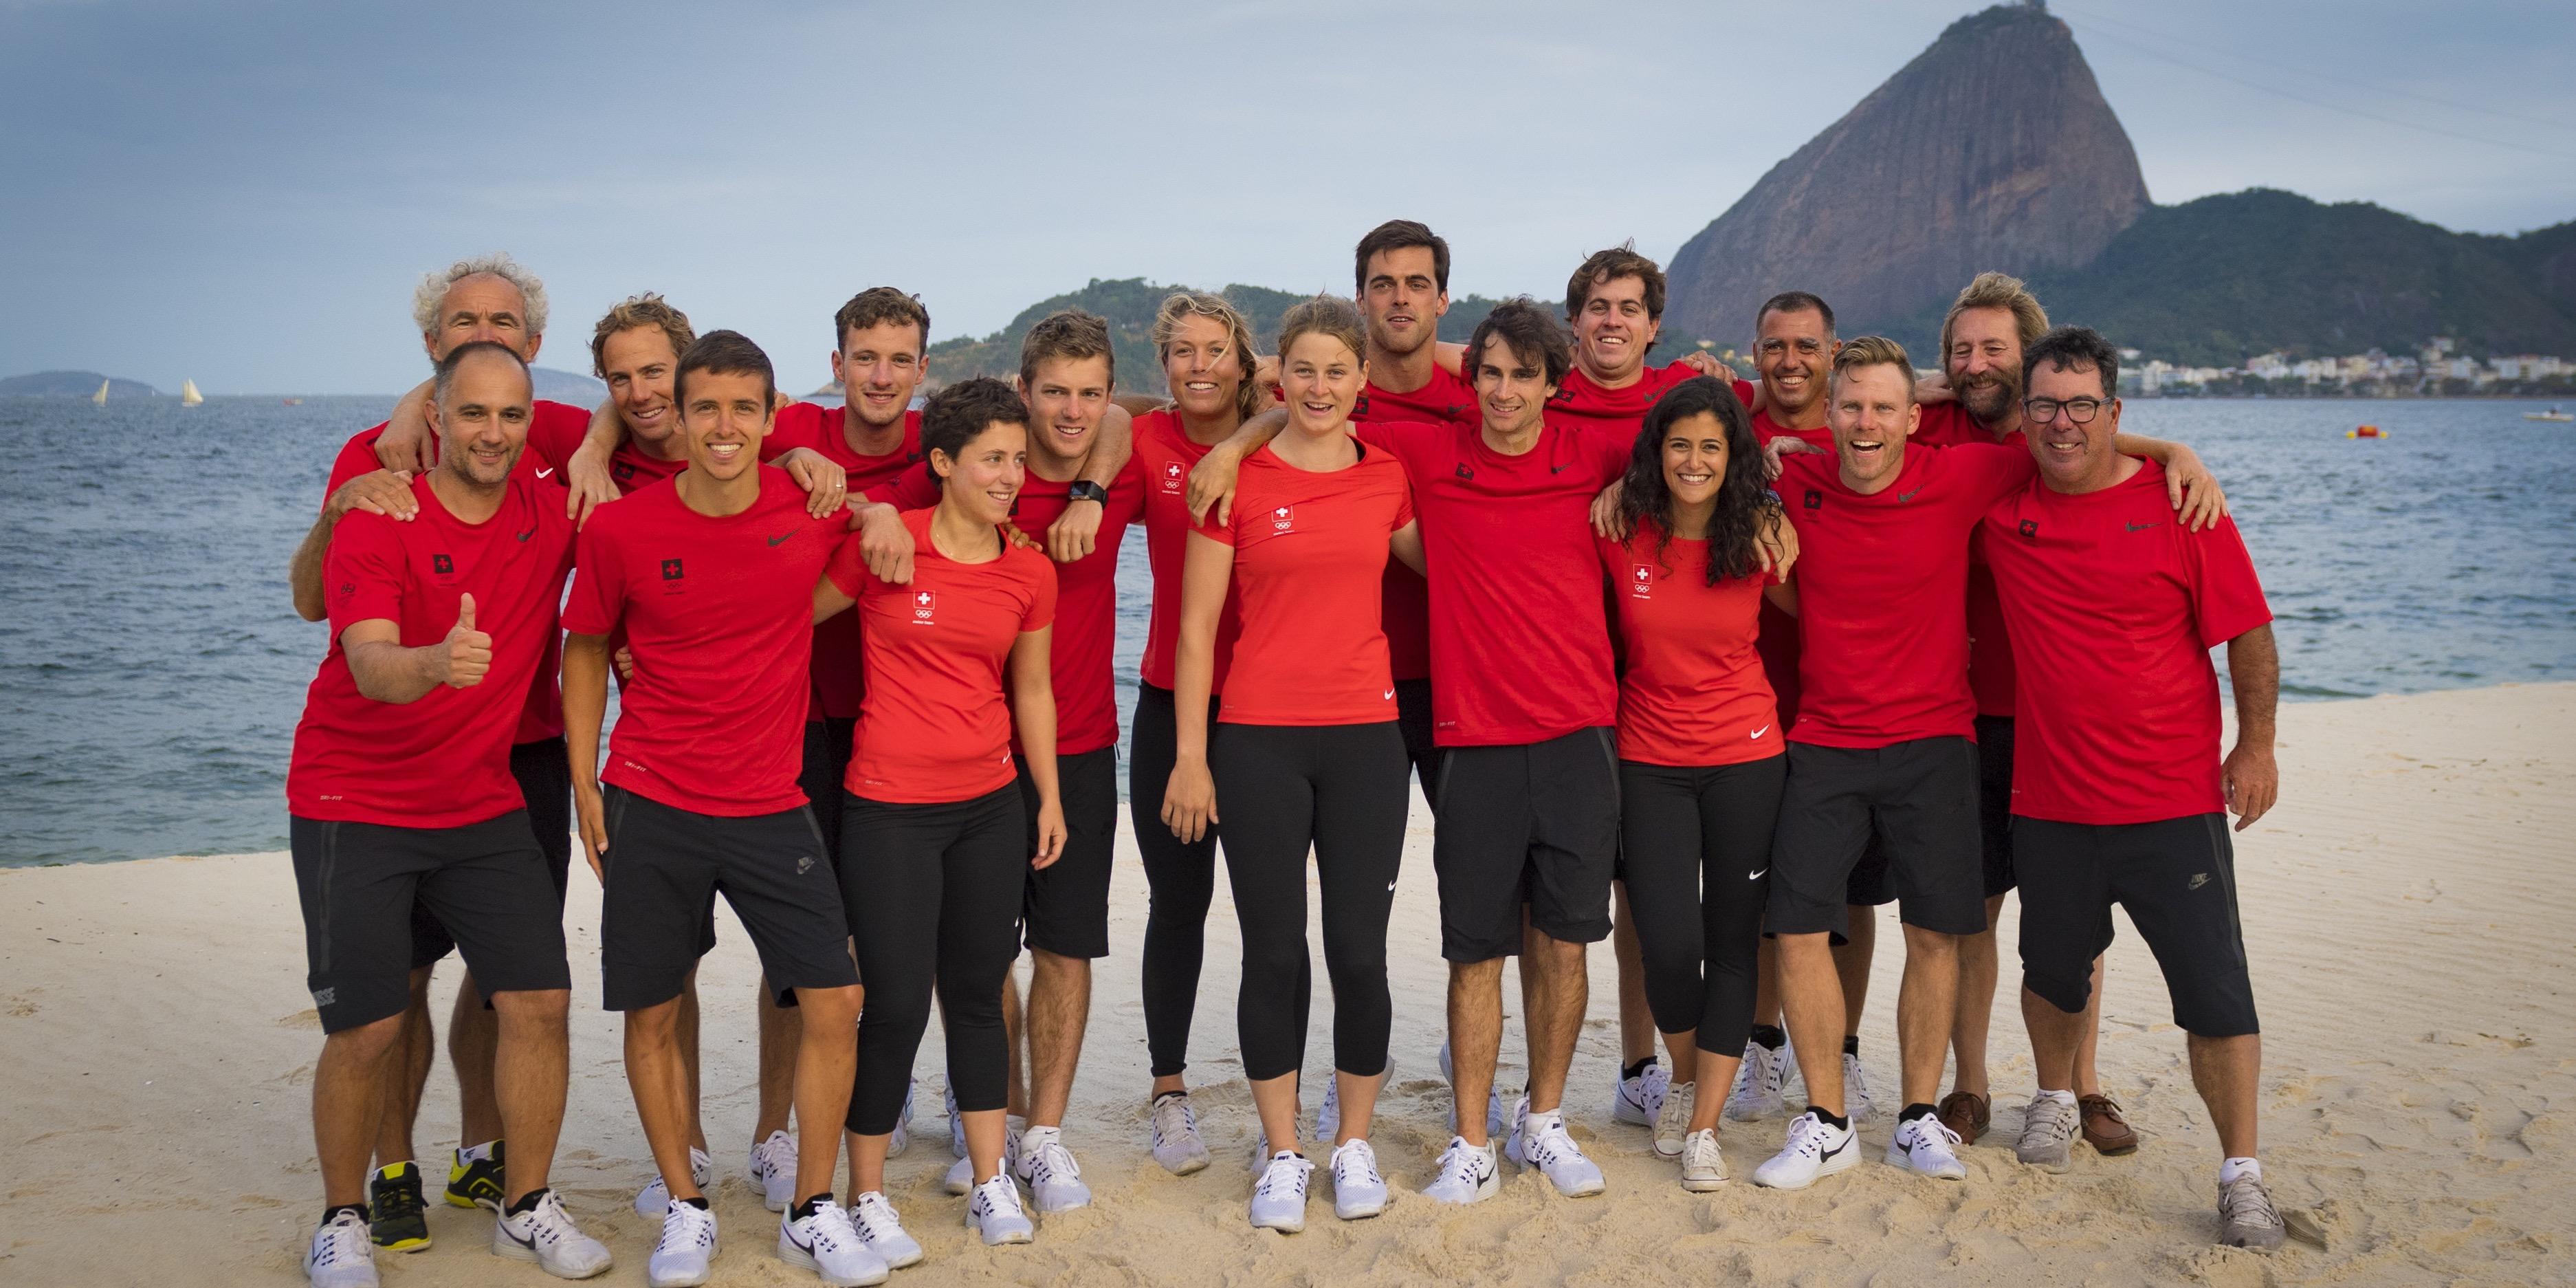 Brazil Rio de Janeiro 2. August 2016 Marina di Gloria, Rio 2016 Olympic Games,  Swiss Olympic Sailing Team